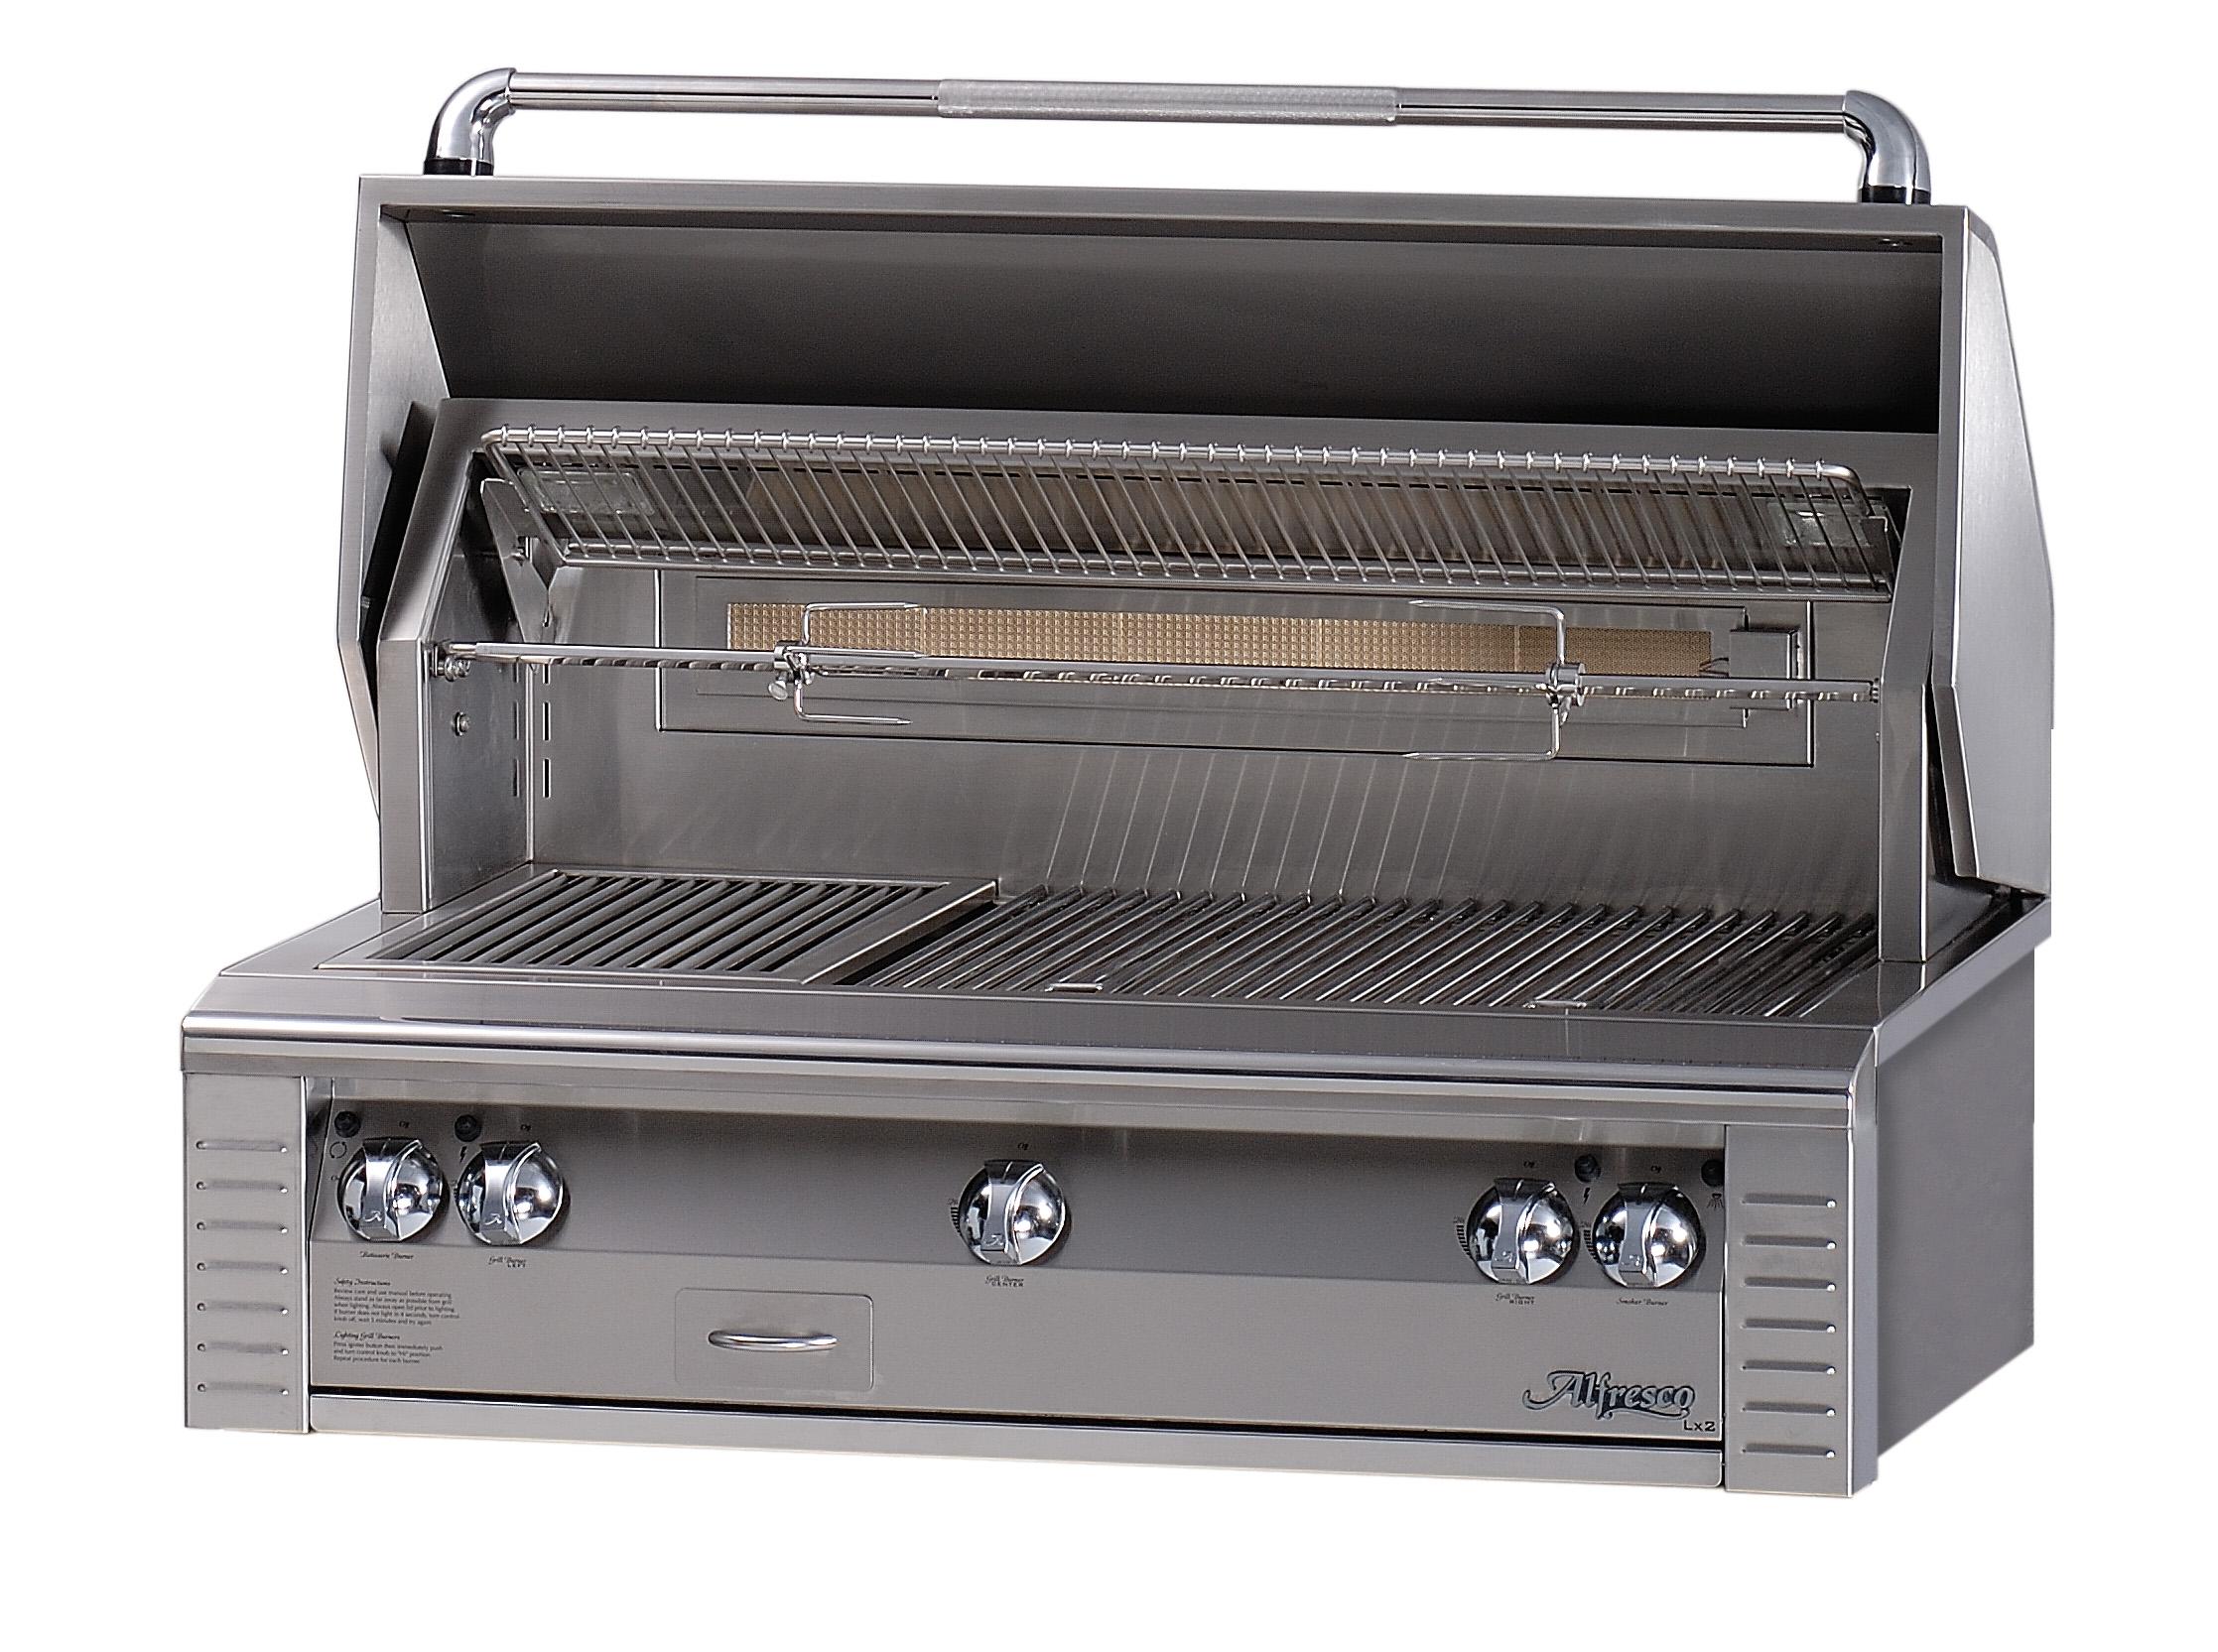 alfresco barbecue grills accessories las vegas outdoor